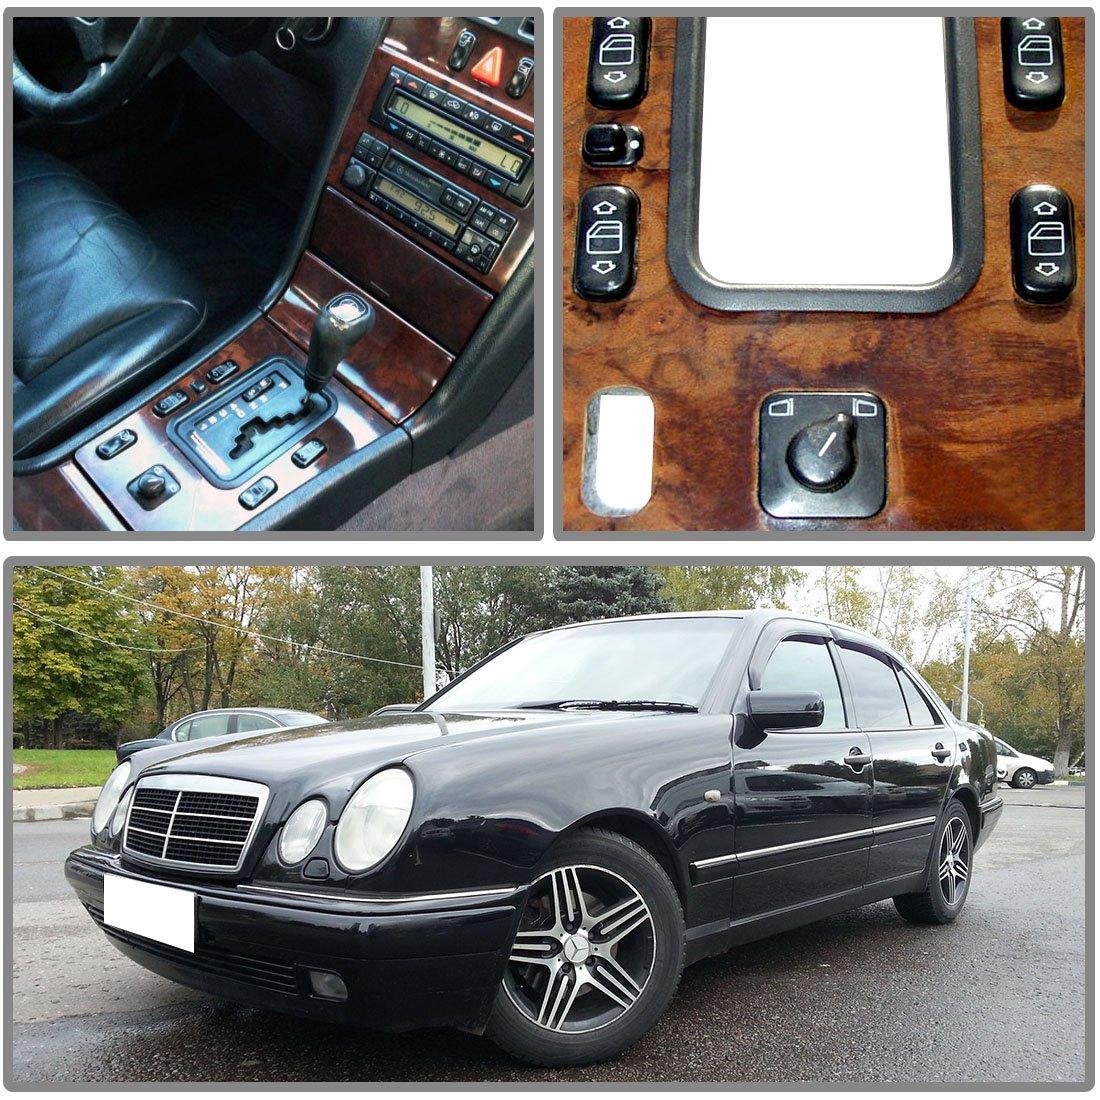 Amazon.com: Window Rocker Switch Pack Console - for Mercedes-Benz E-Class  W210 E300 E320 E420 E430 E55 AMG - window control, mirror adjust: Automotive